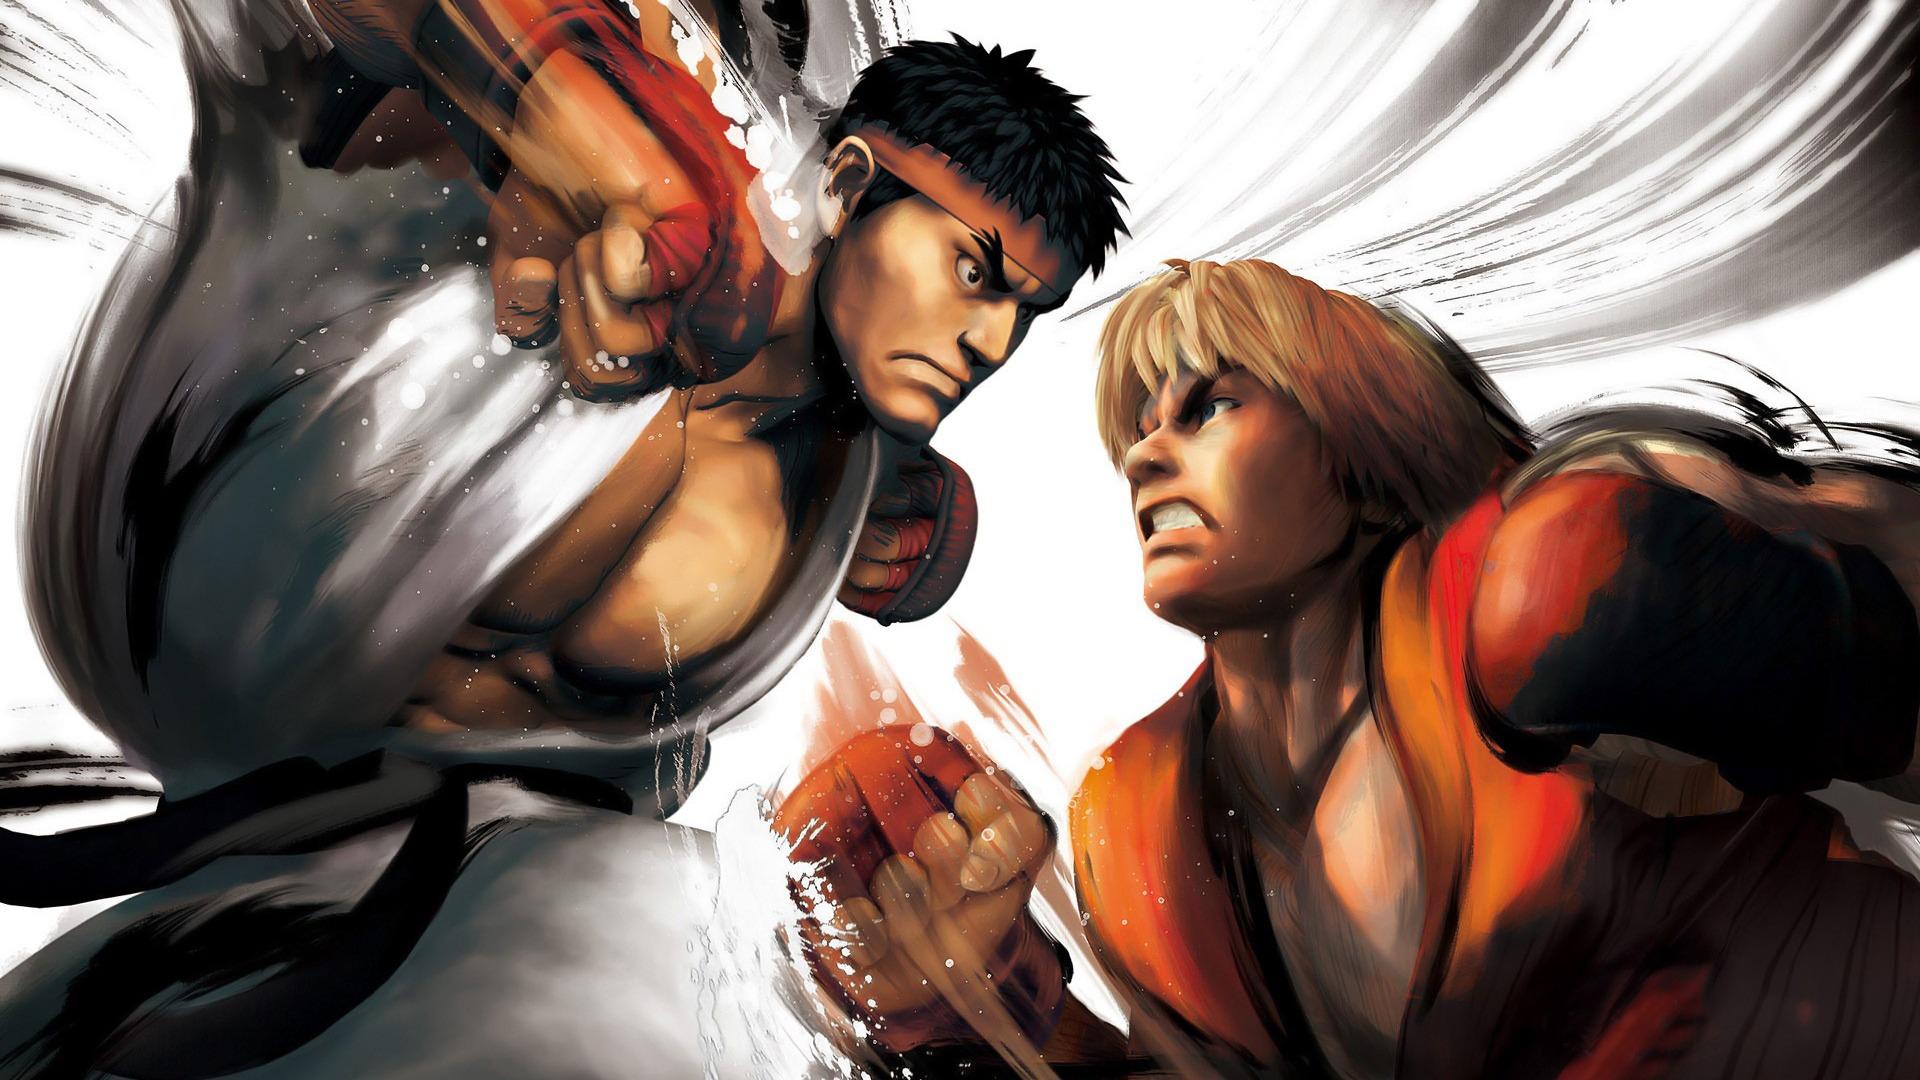 street fighter ryu wallpaper hd